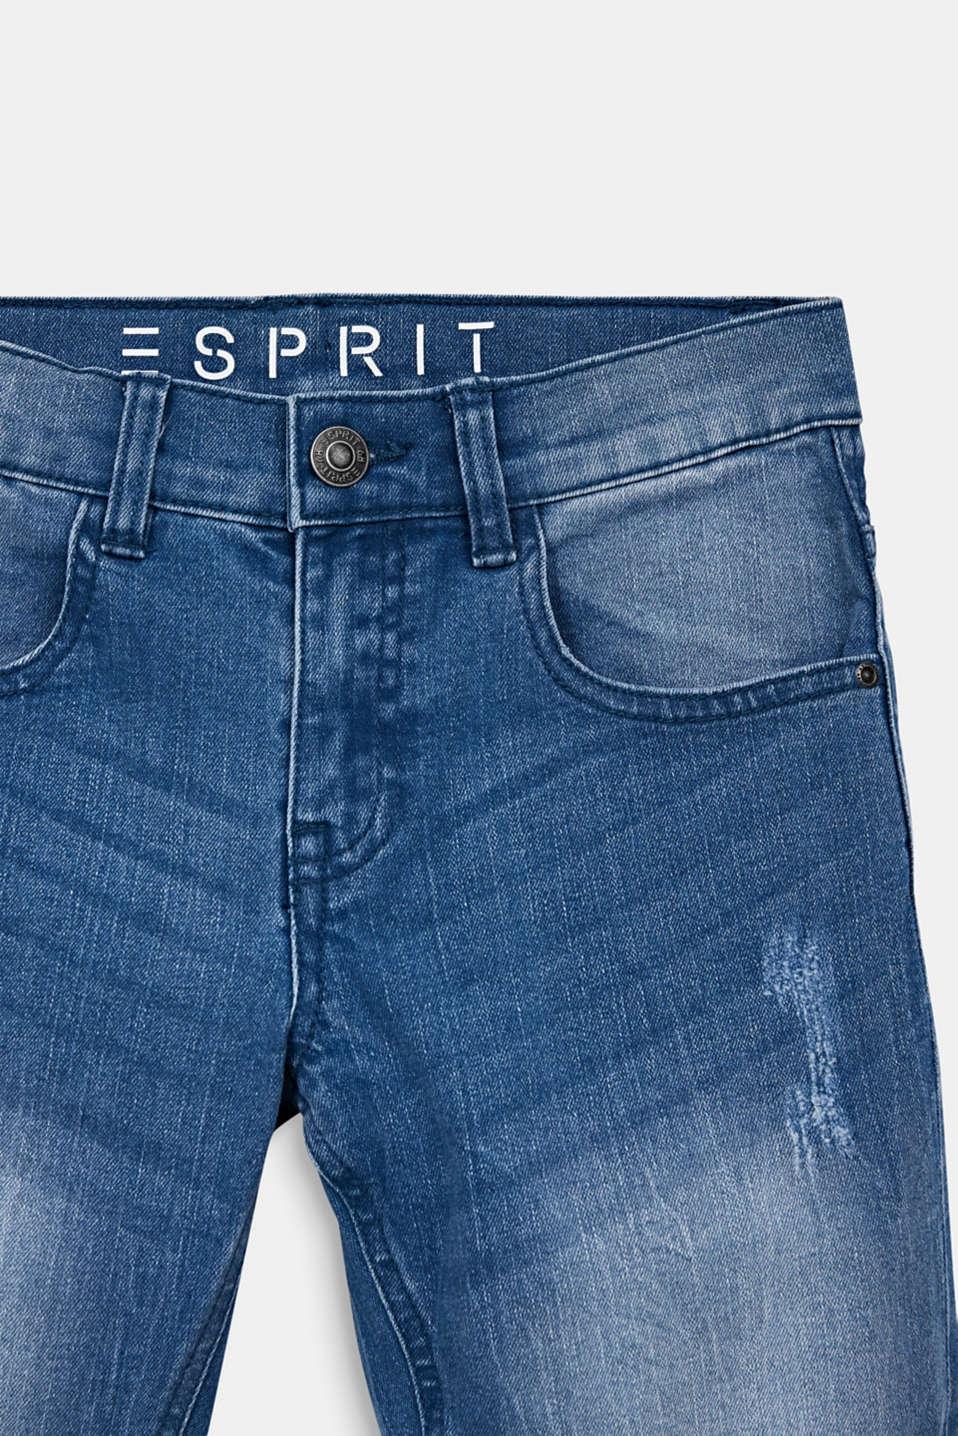 Denim shorts in a vintage finish, LCLIGHT INDIGO D, detail image number 2